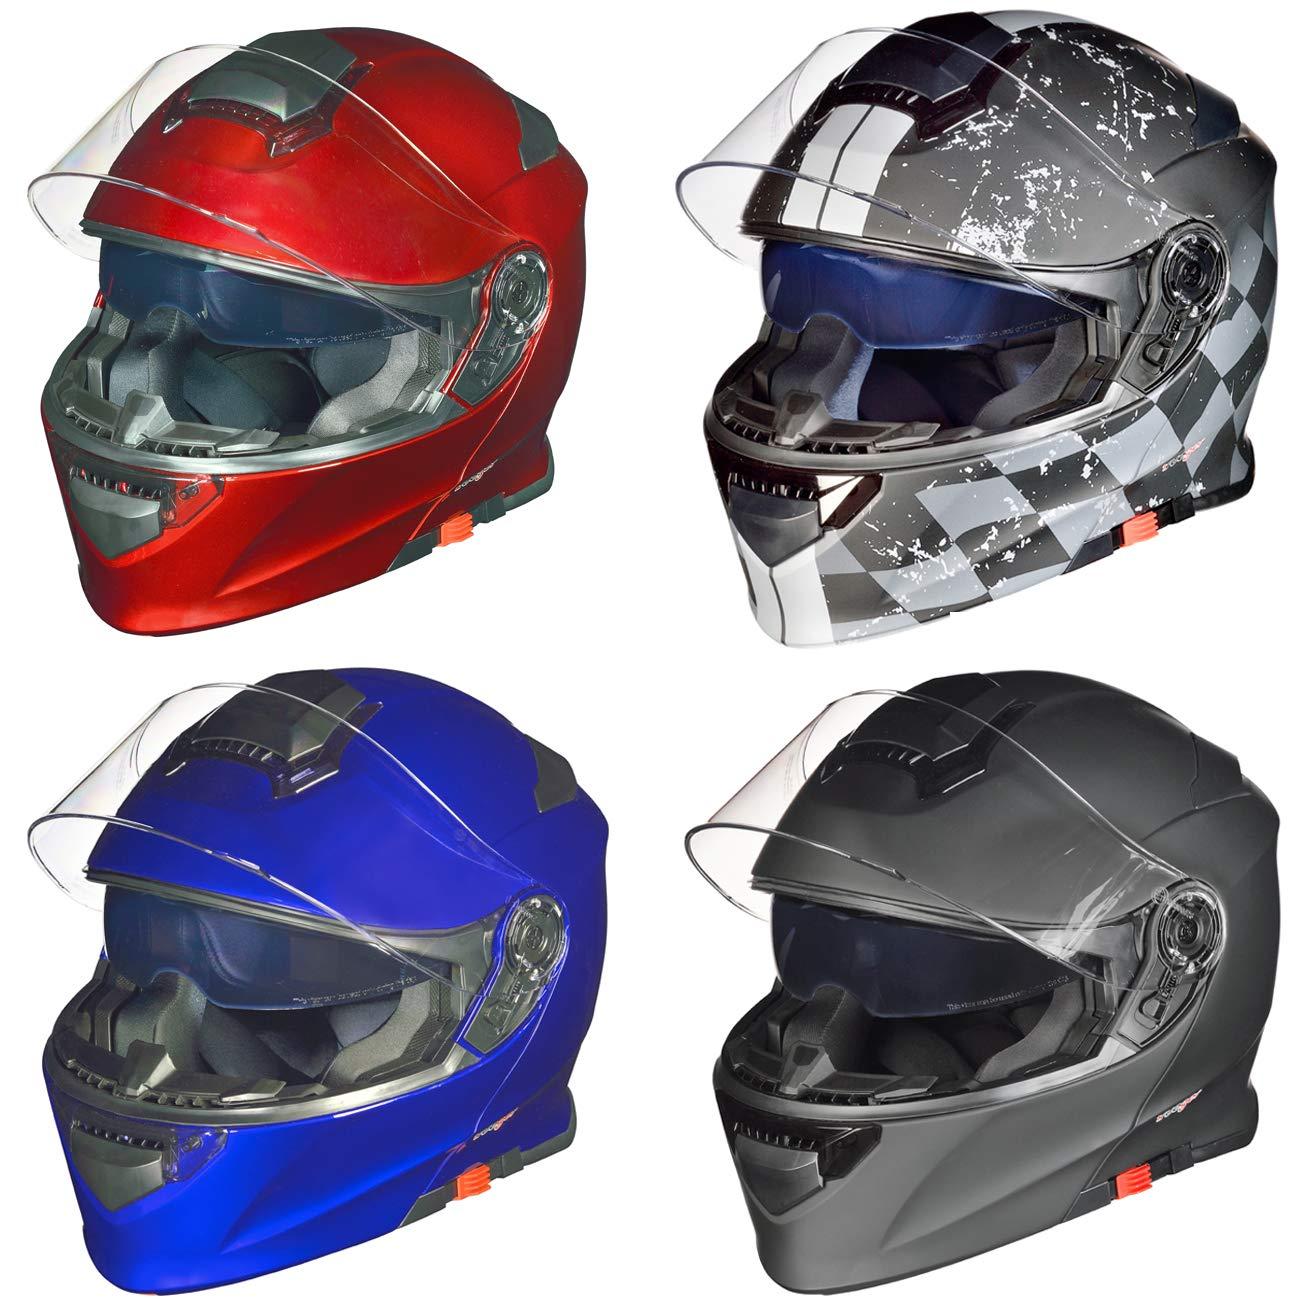 57-58 RS-982 Klapphelm Motorradhelm Conzept Motorrad Modular Roller Helm rueger Gr/ö/ße:M Farbe:Blau